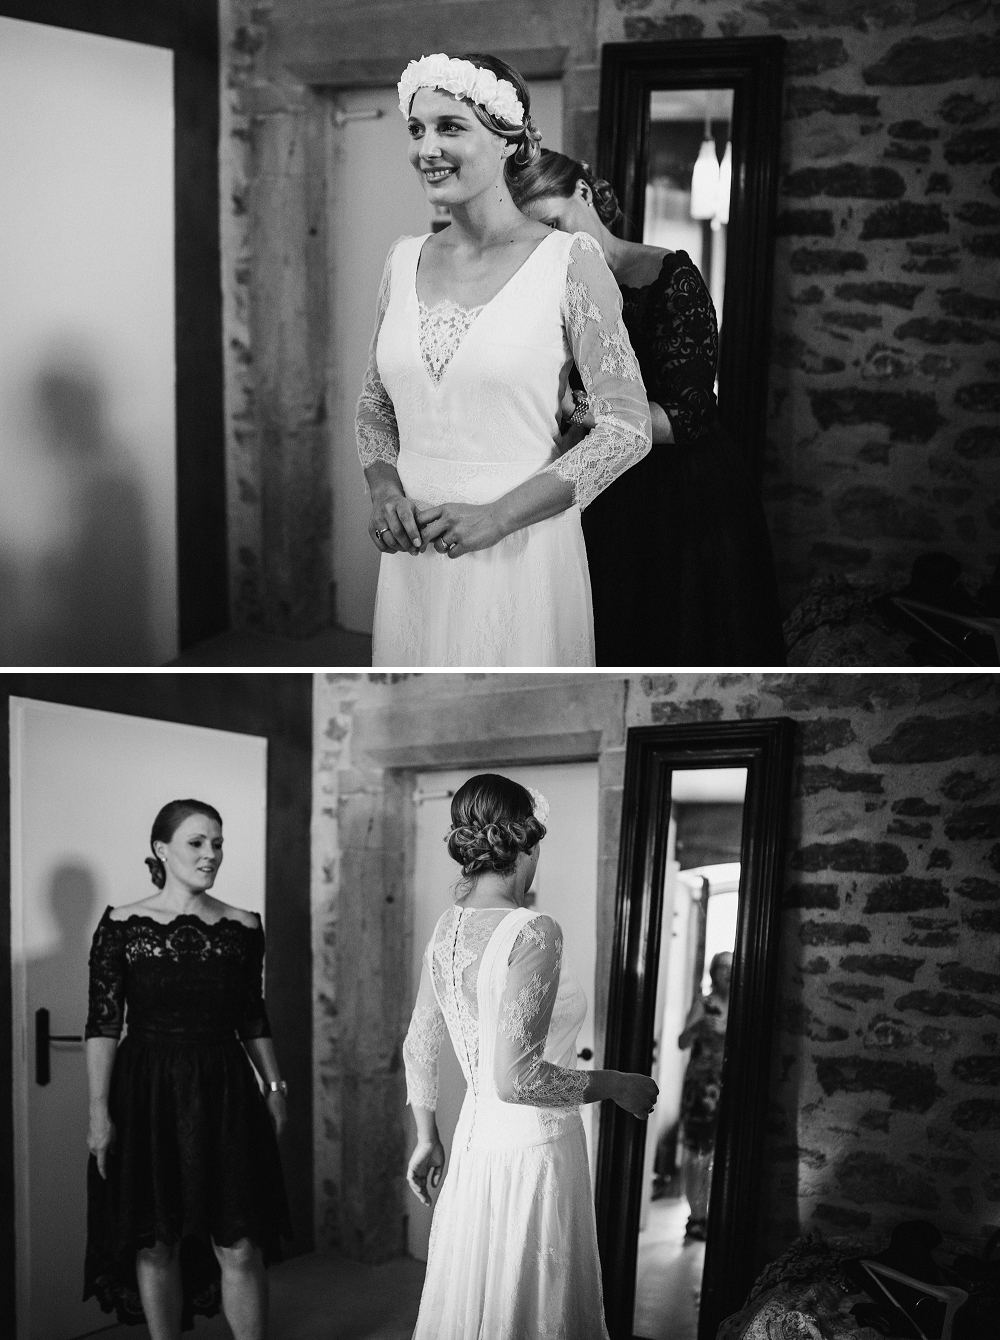 mariage-morimont-07.jpg